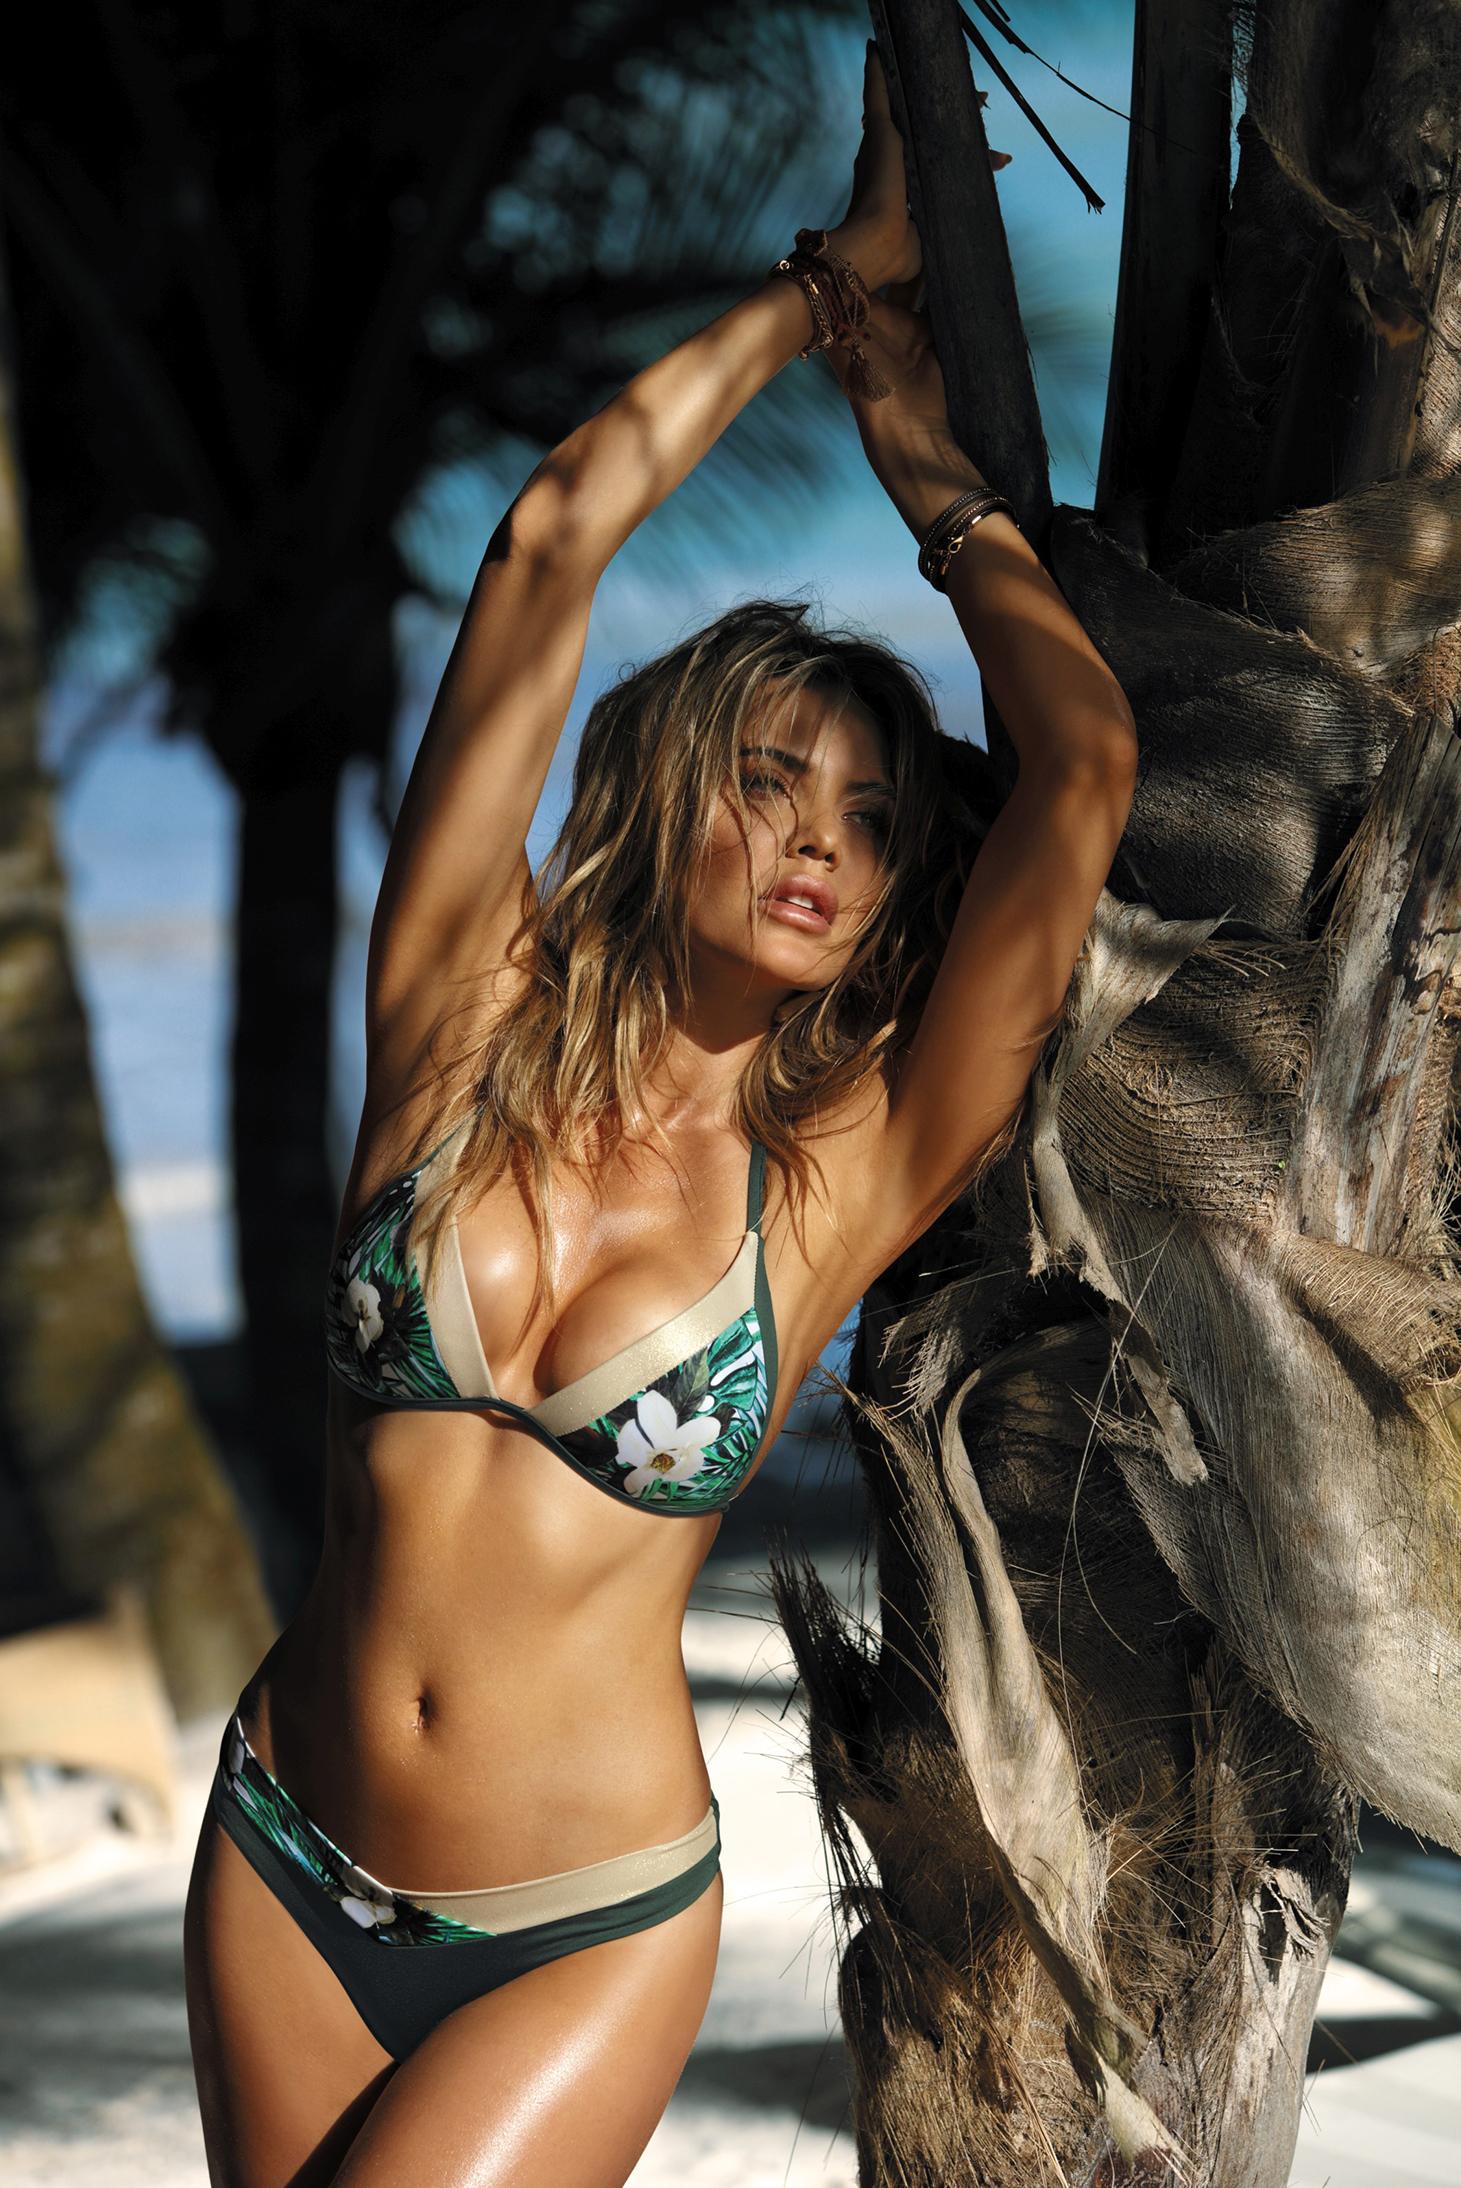 normal-girl-bikini-model